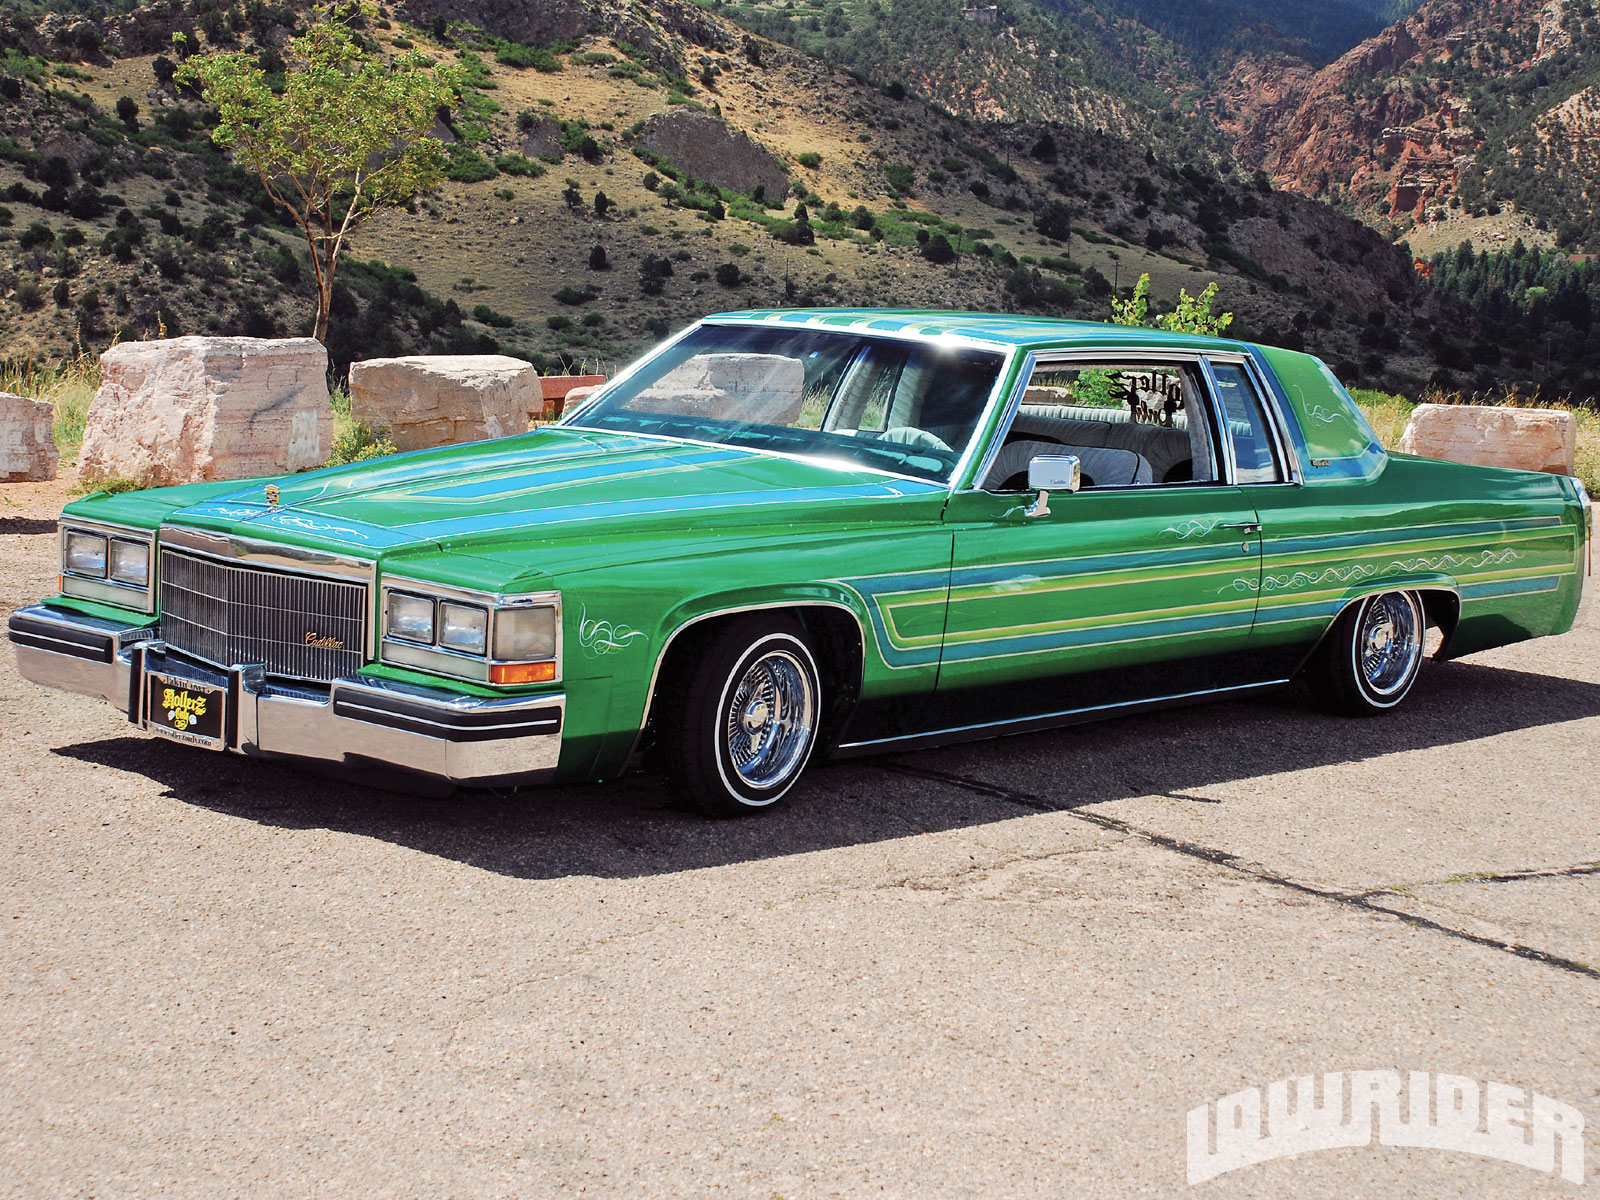 1984 Cadillac Coupe DeVille - Lowrider Magazine